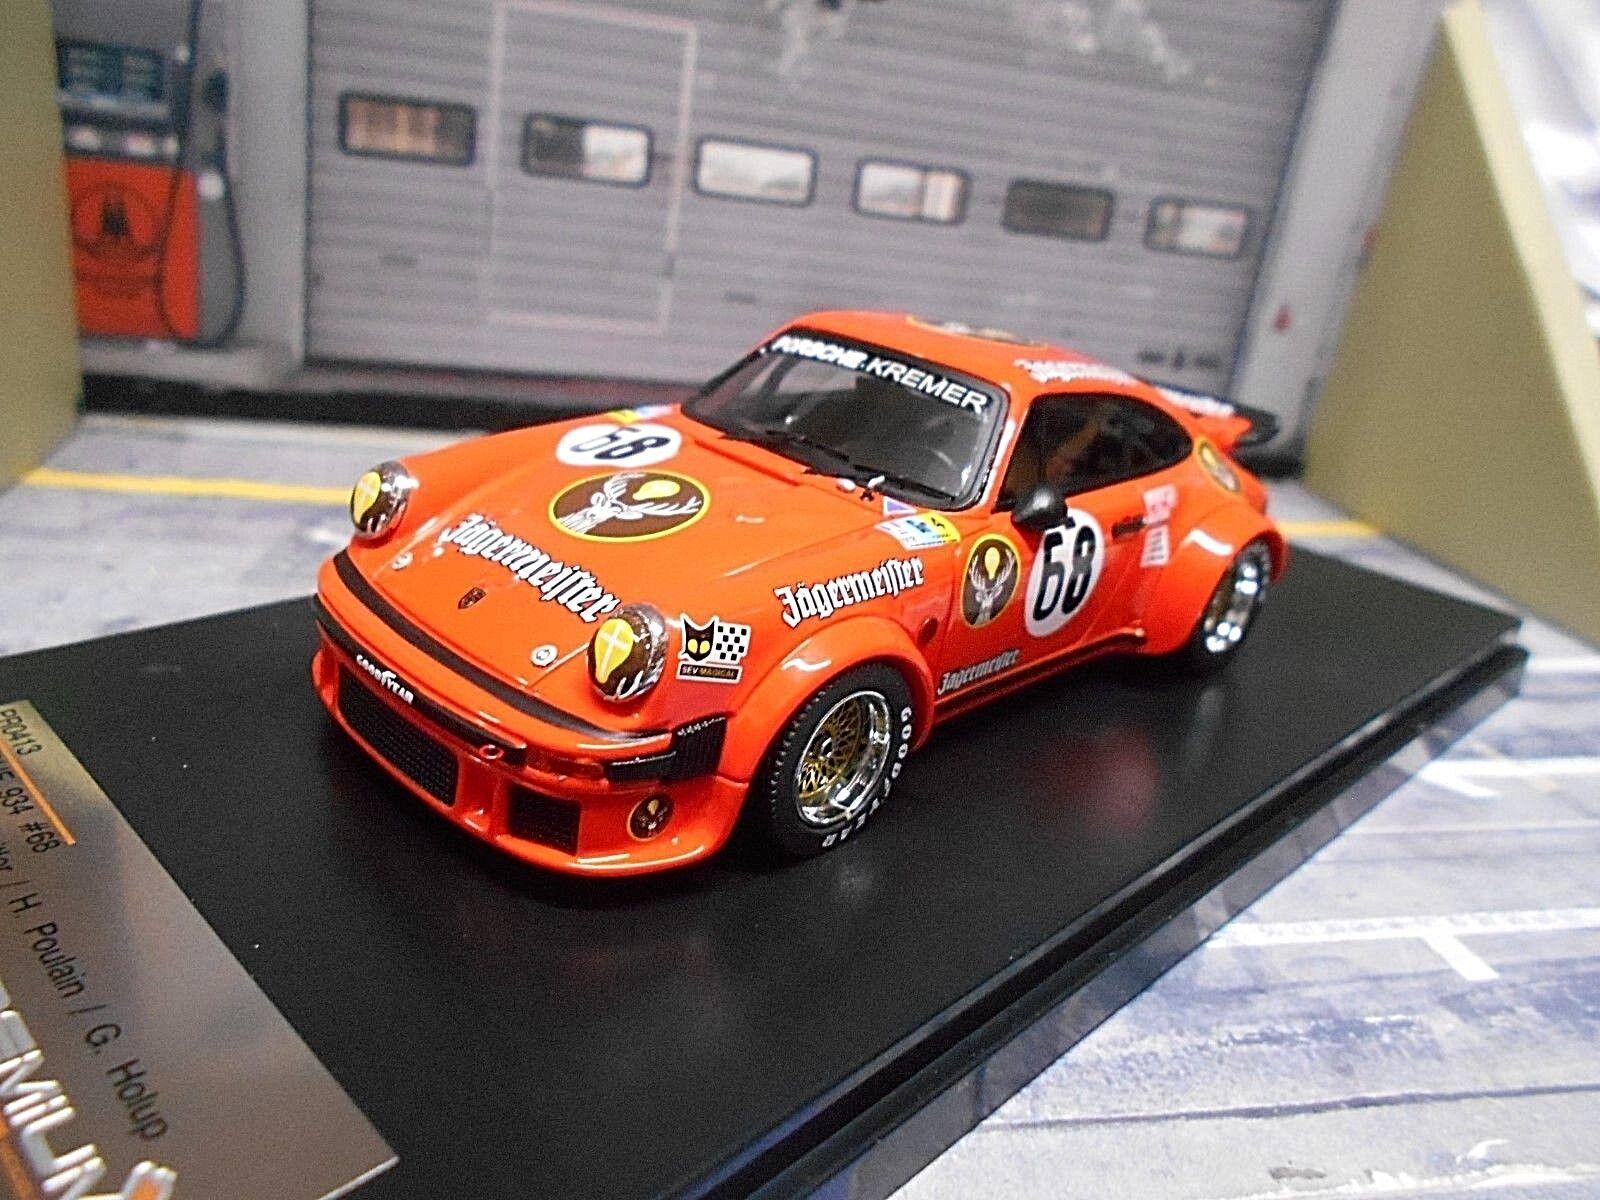 Porsche 911 934 TURBO LE MANS  68 Jagermeister Dören feitler Holub IXO X pr 1 43